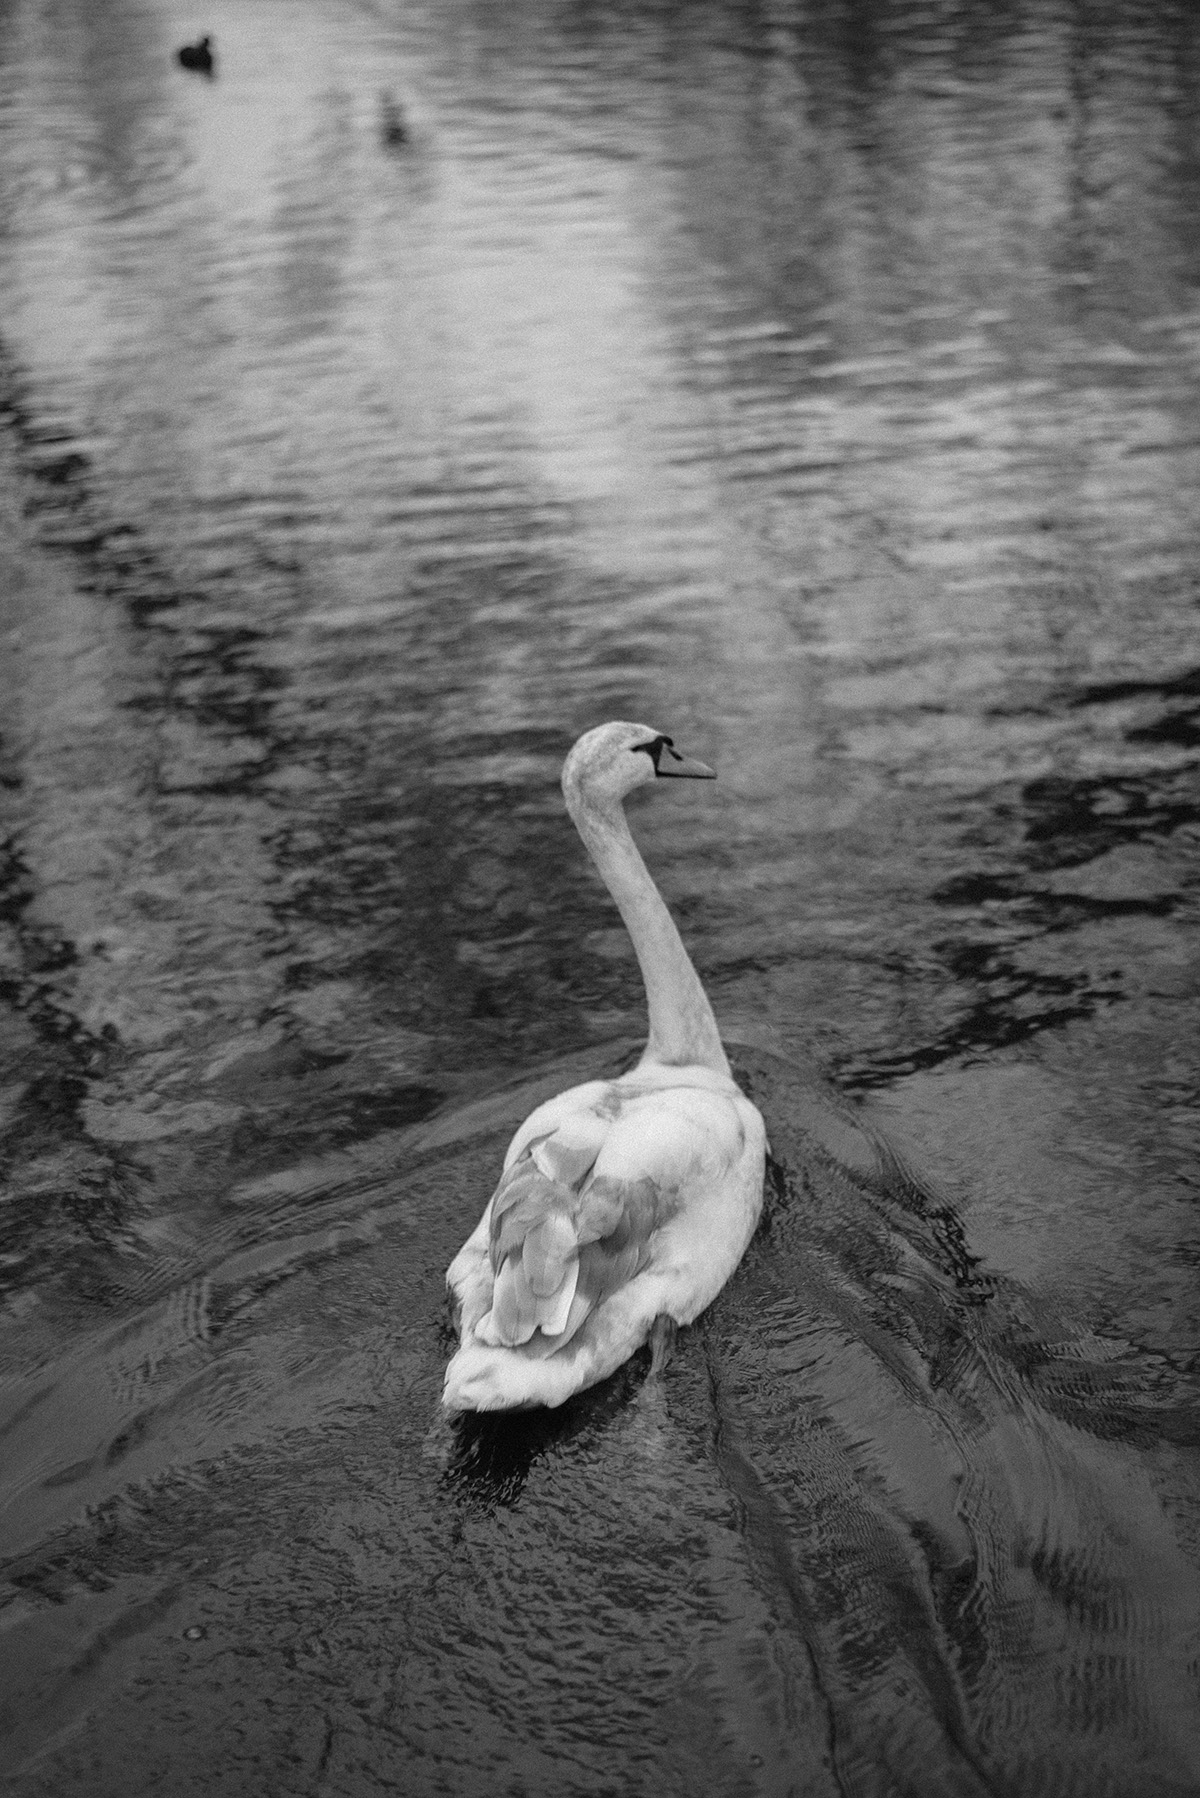 swan-lake-black-and-white-patricia-martins-yellowish-2019